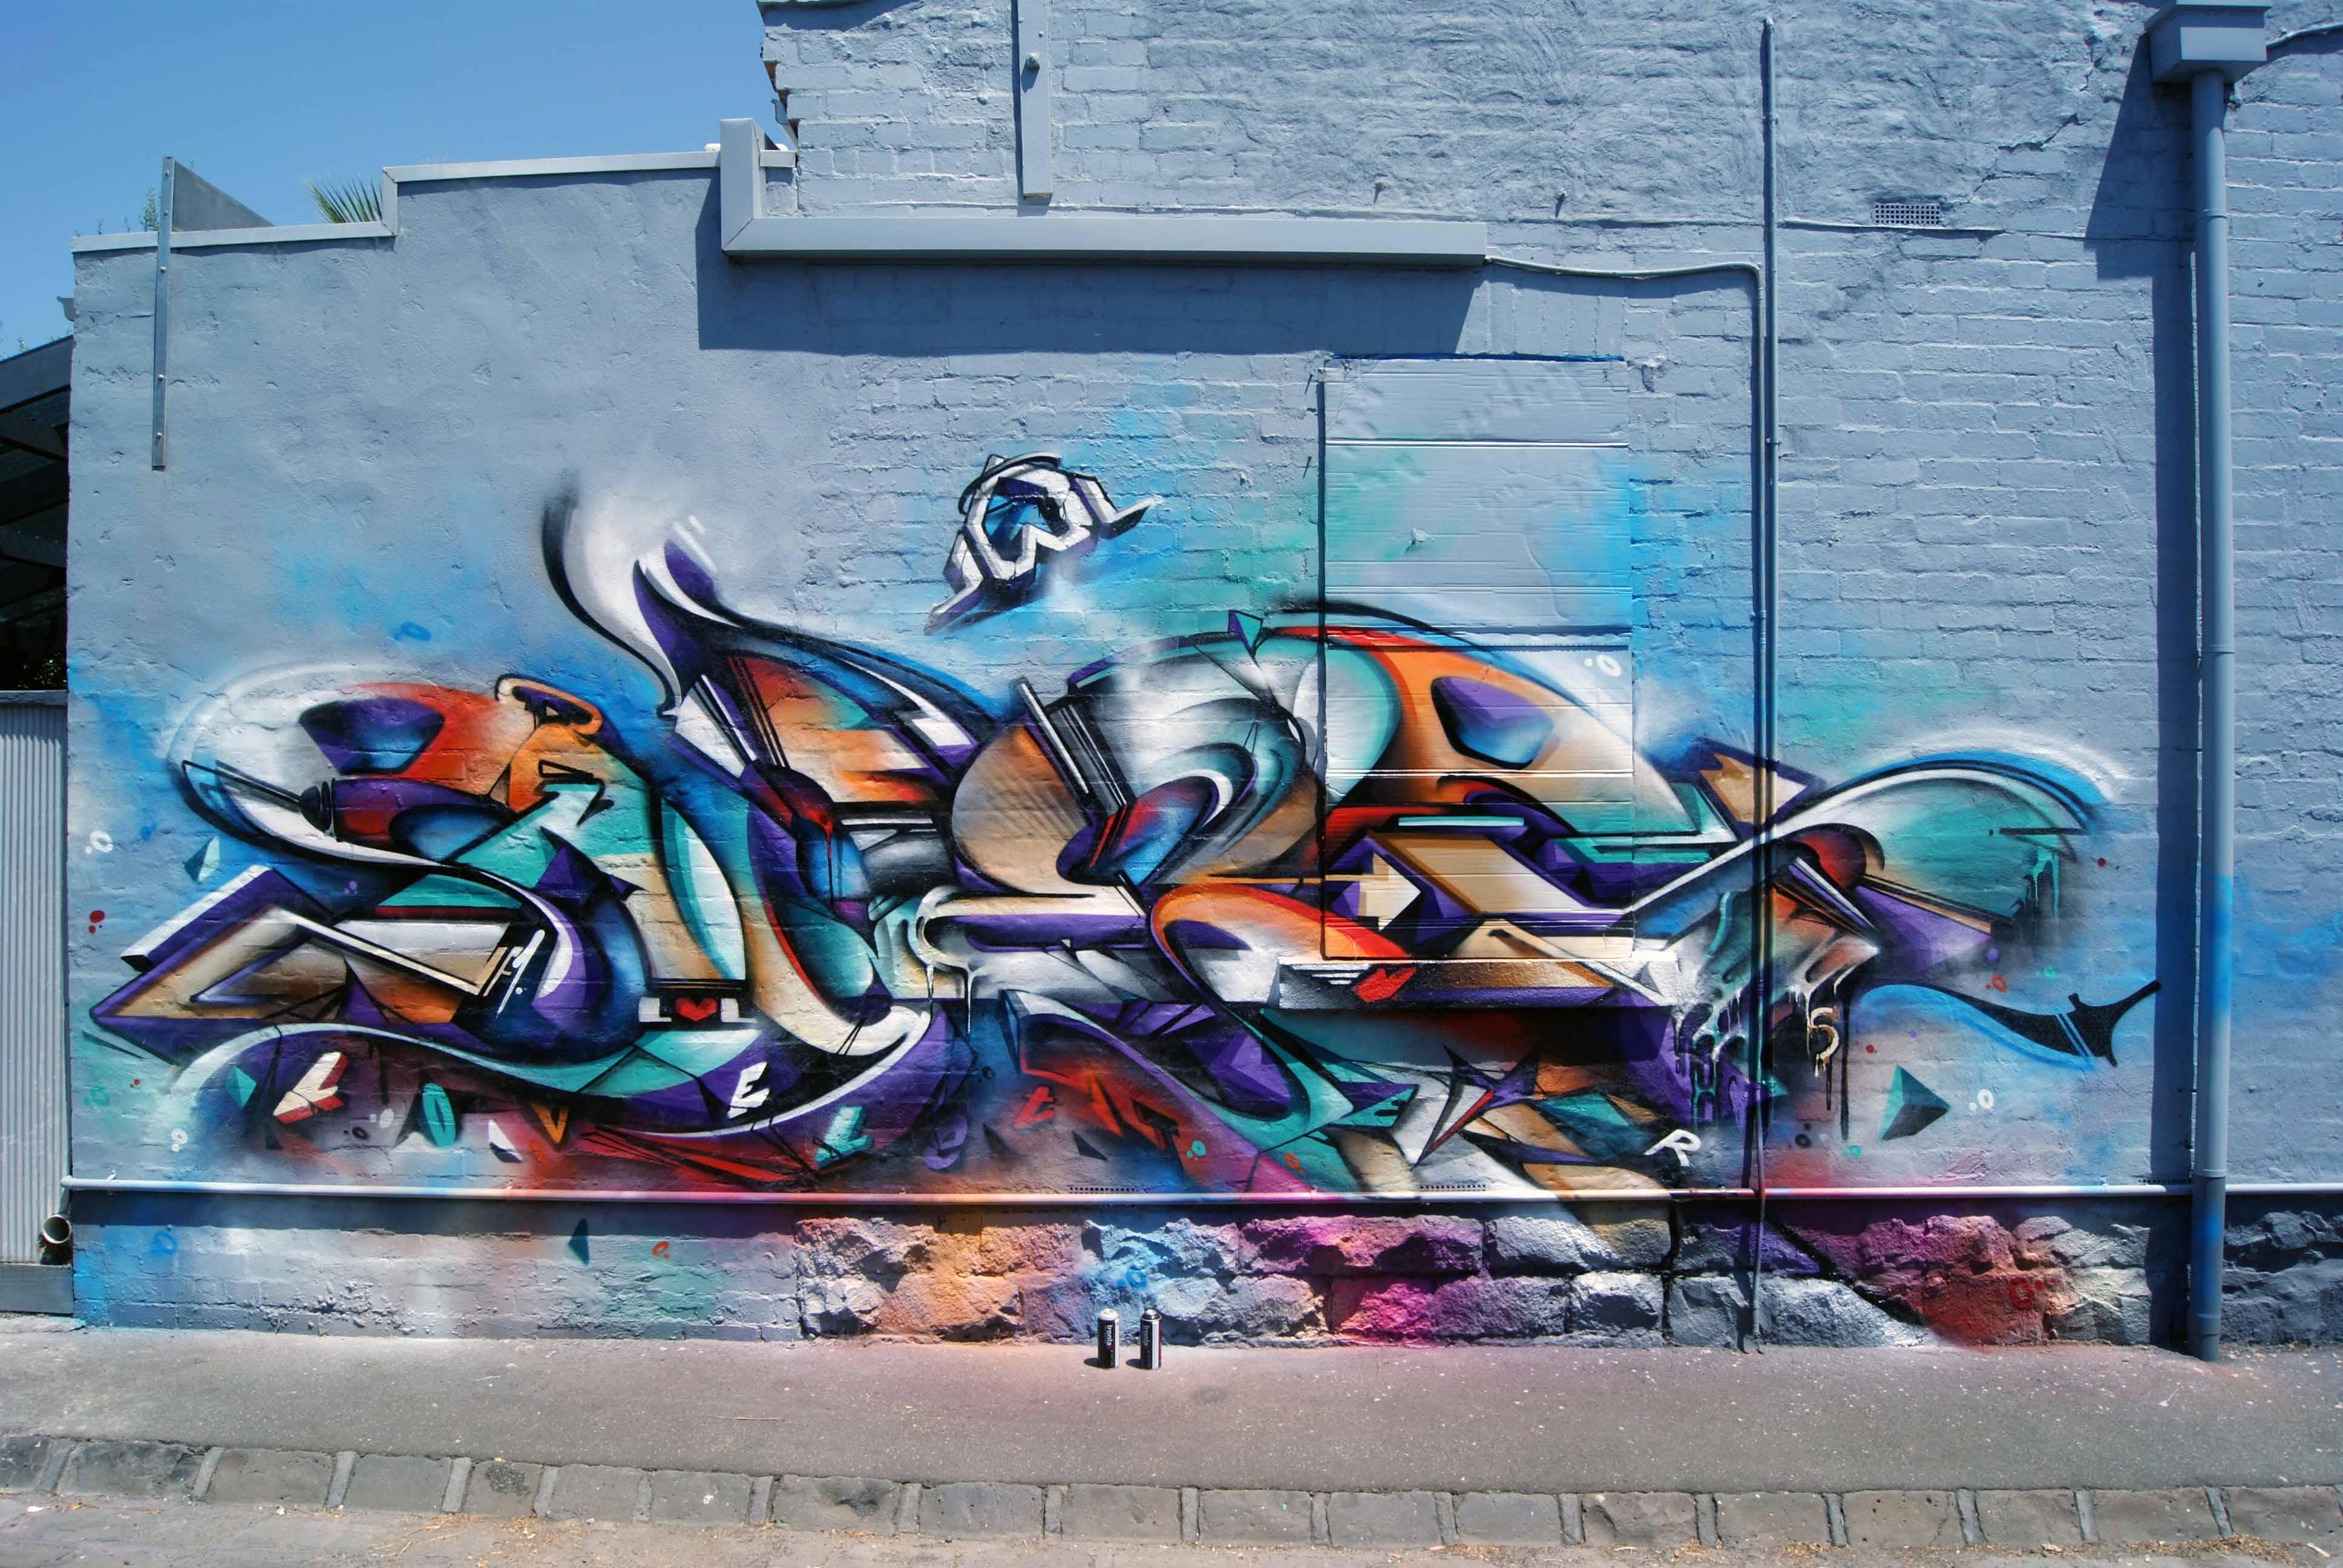 как фотки граффити граффити фотографий документов братеево